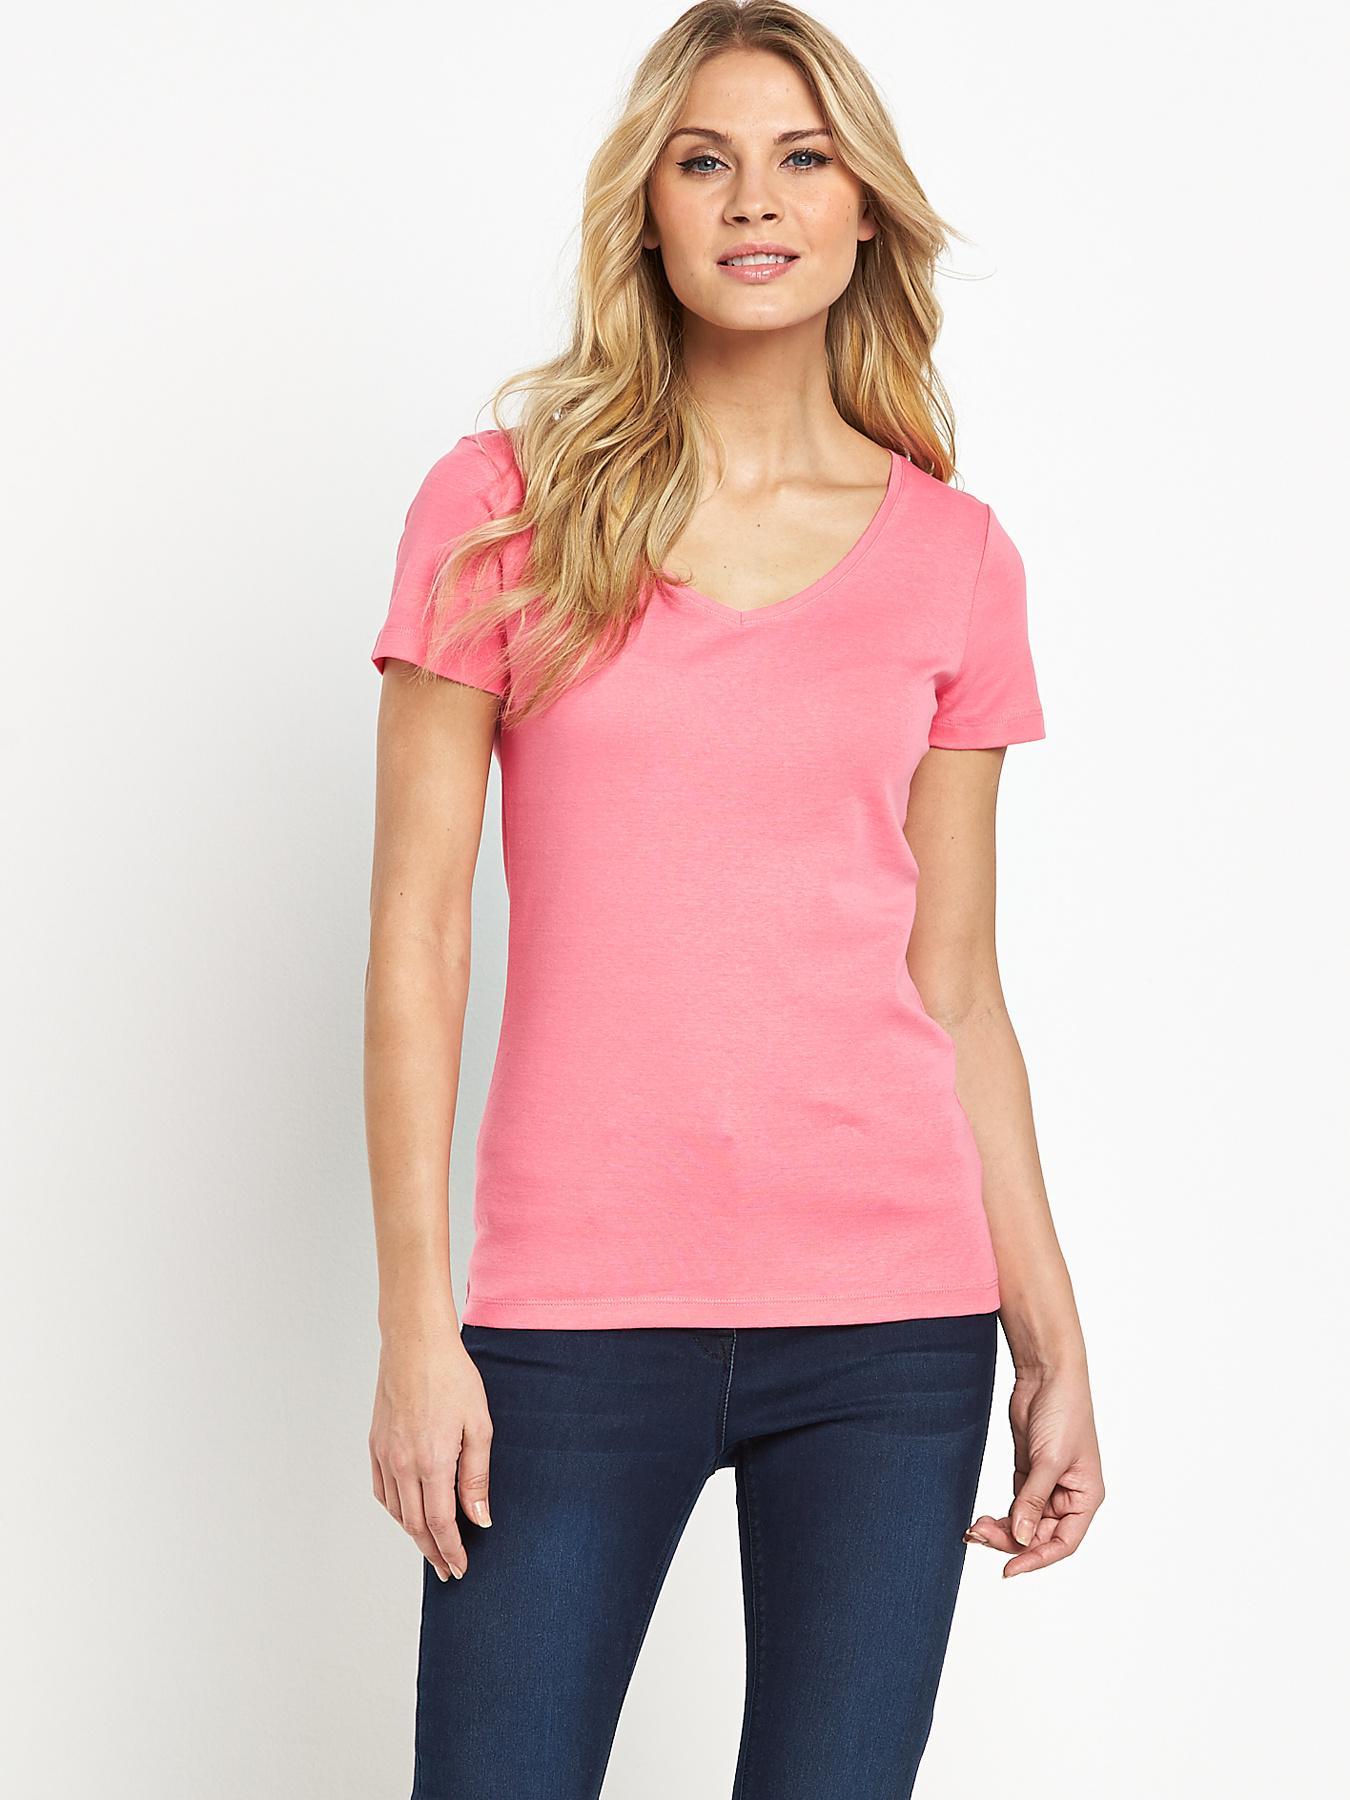 Short Sleeved V-Neck Rib T-shirt, Pink at Littlewoods